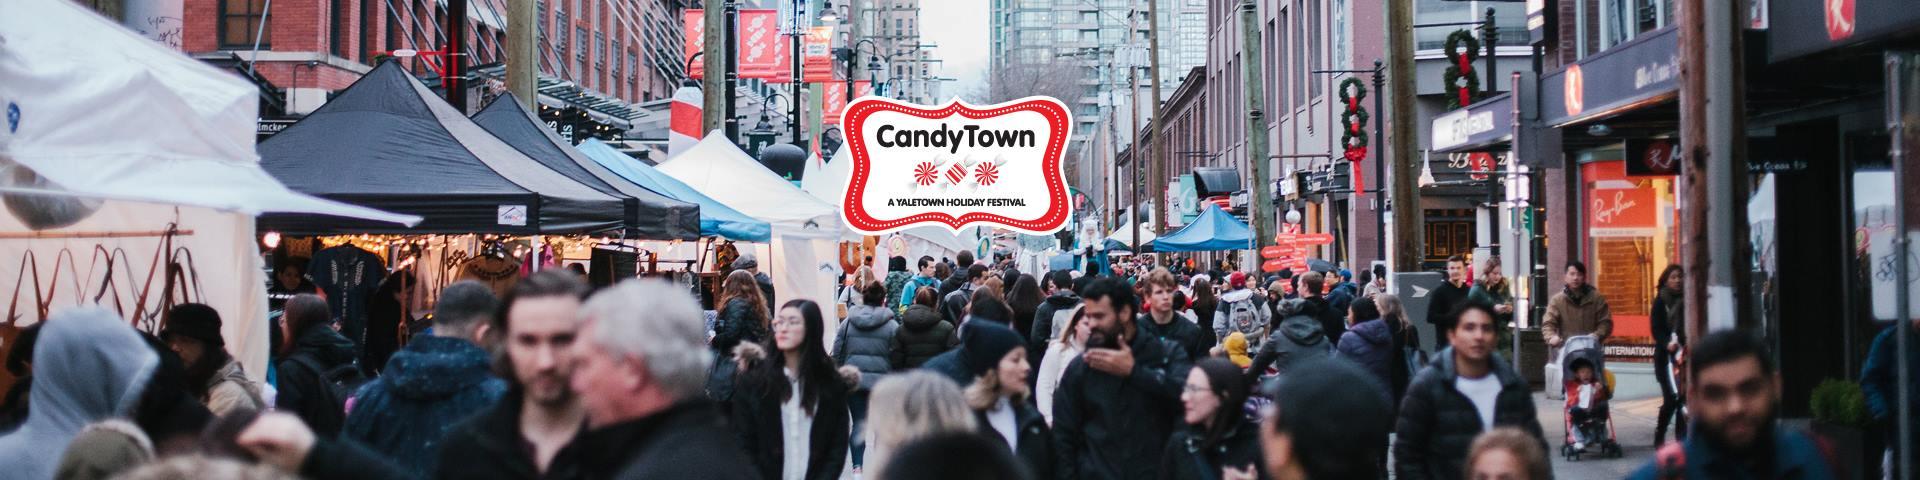 Candytown.jpg